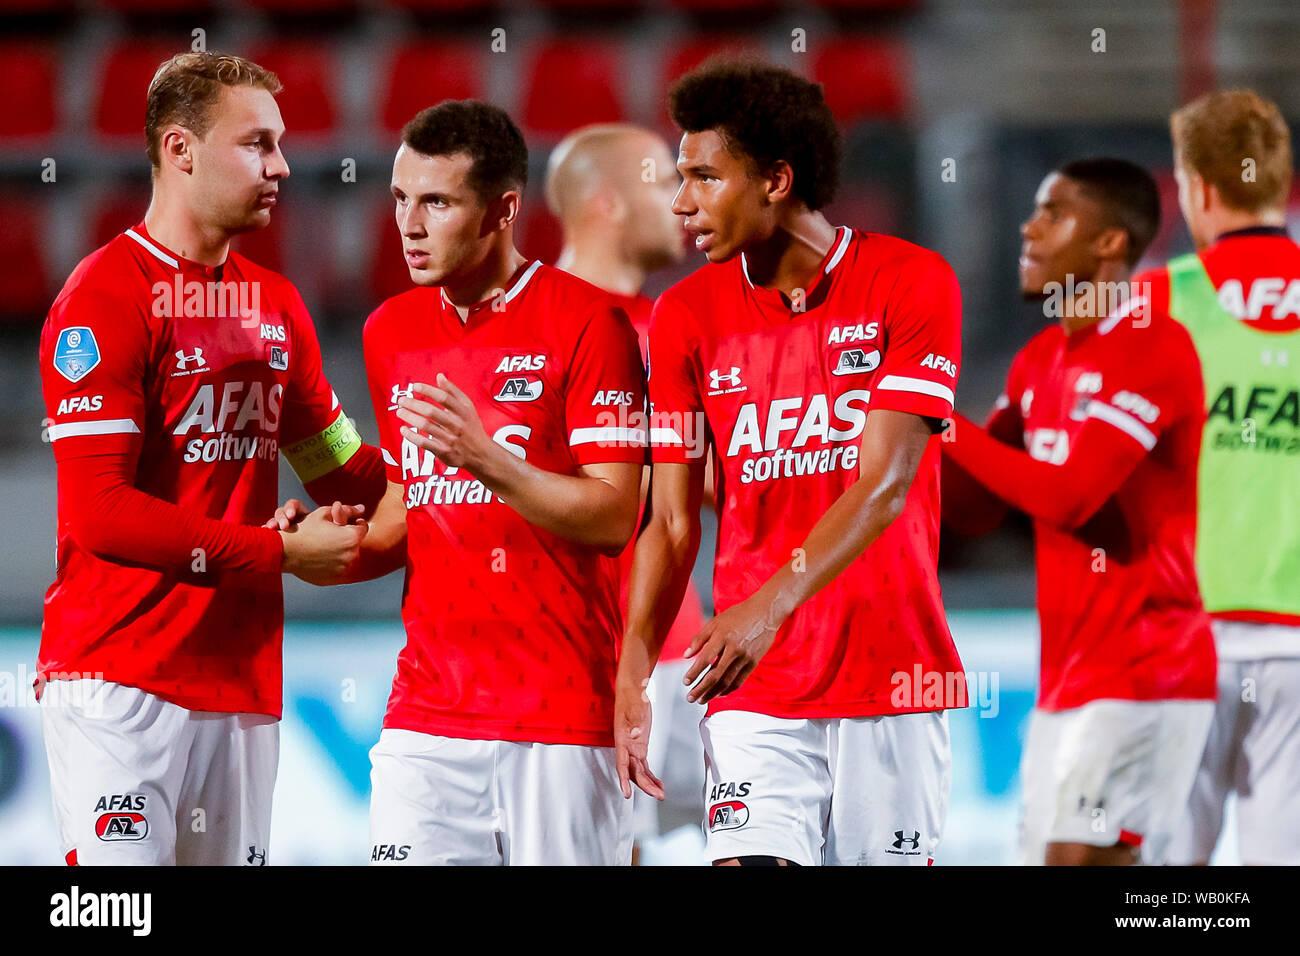 Enschede Az Royal Antwerp Fc 22 08 2019 Football Season 2019 2020 Qualification Match For Europa